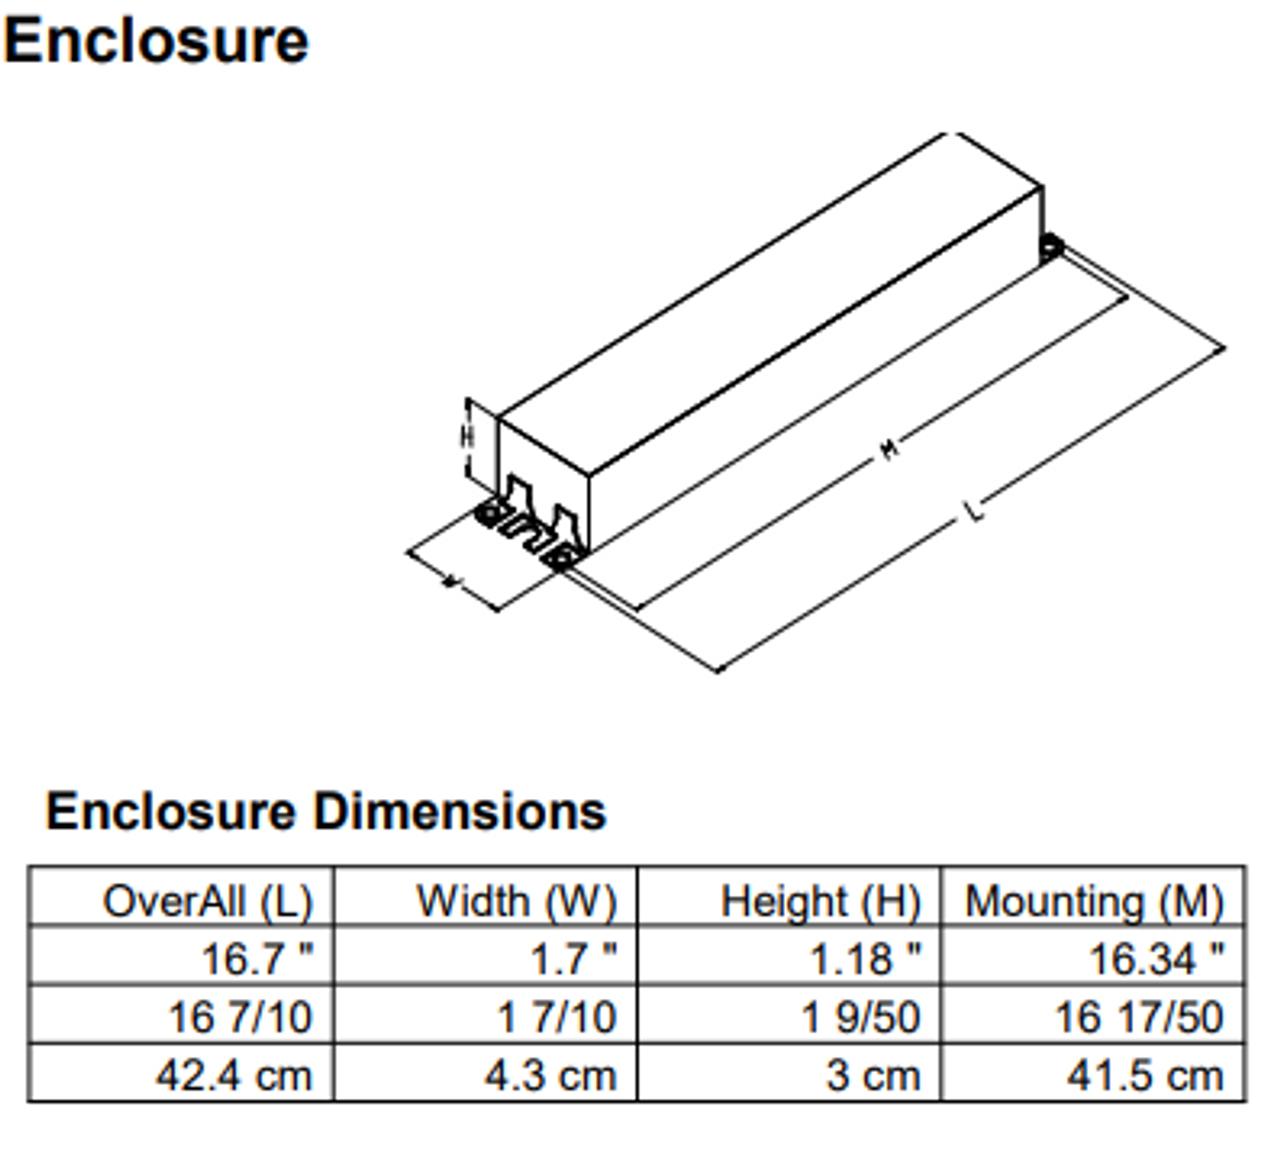 IZT-4PSP32-G Advance MARK 7 Electronic Dimming Ballast   Advance Mark 7 Dimming Ballast Wiring Diagram      BallastShop.com